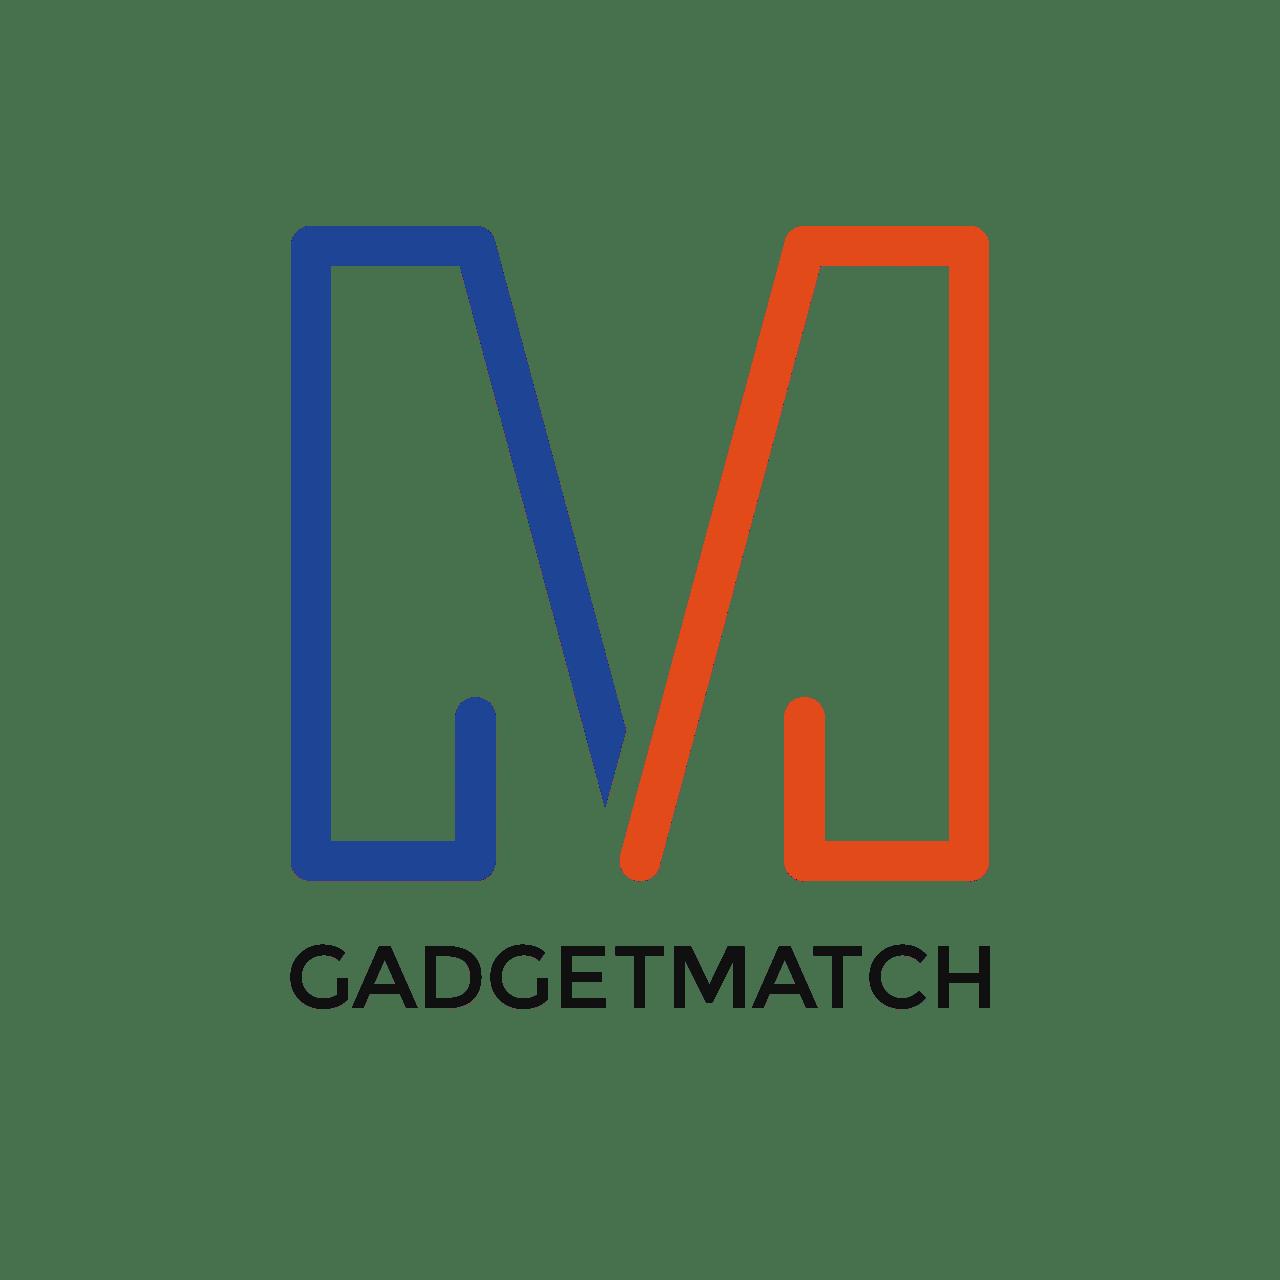 gadgetmatch-transparent